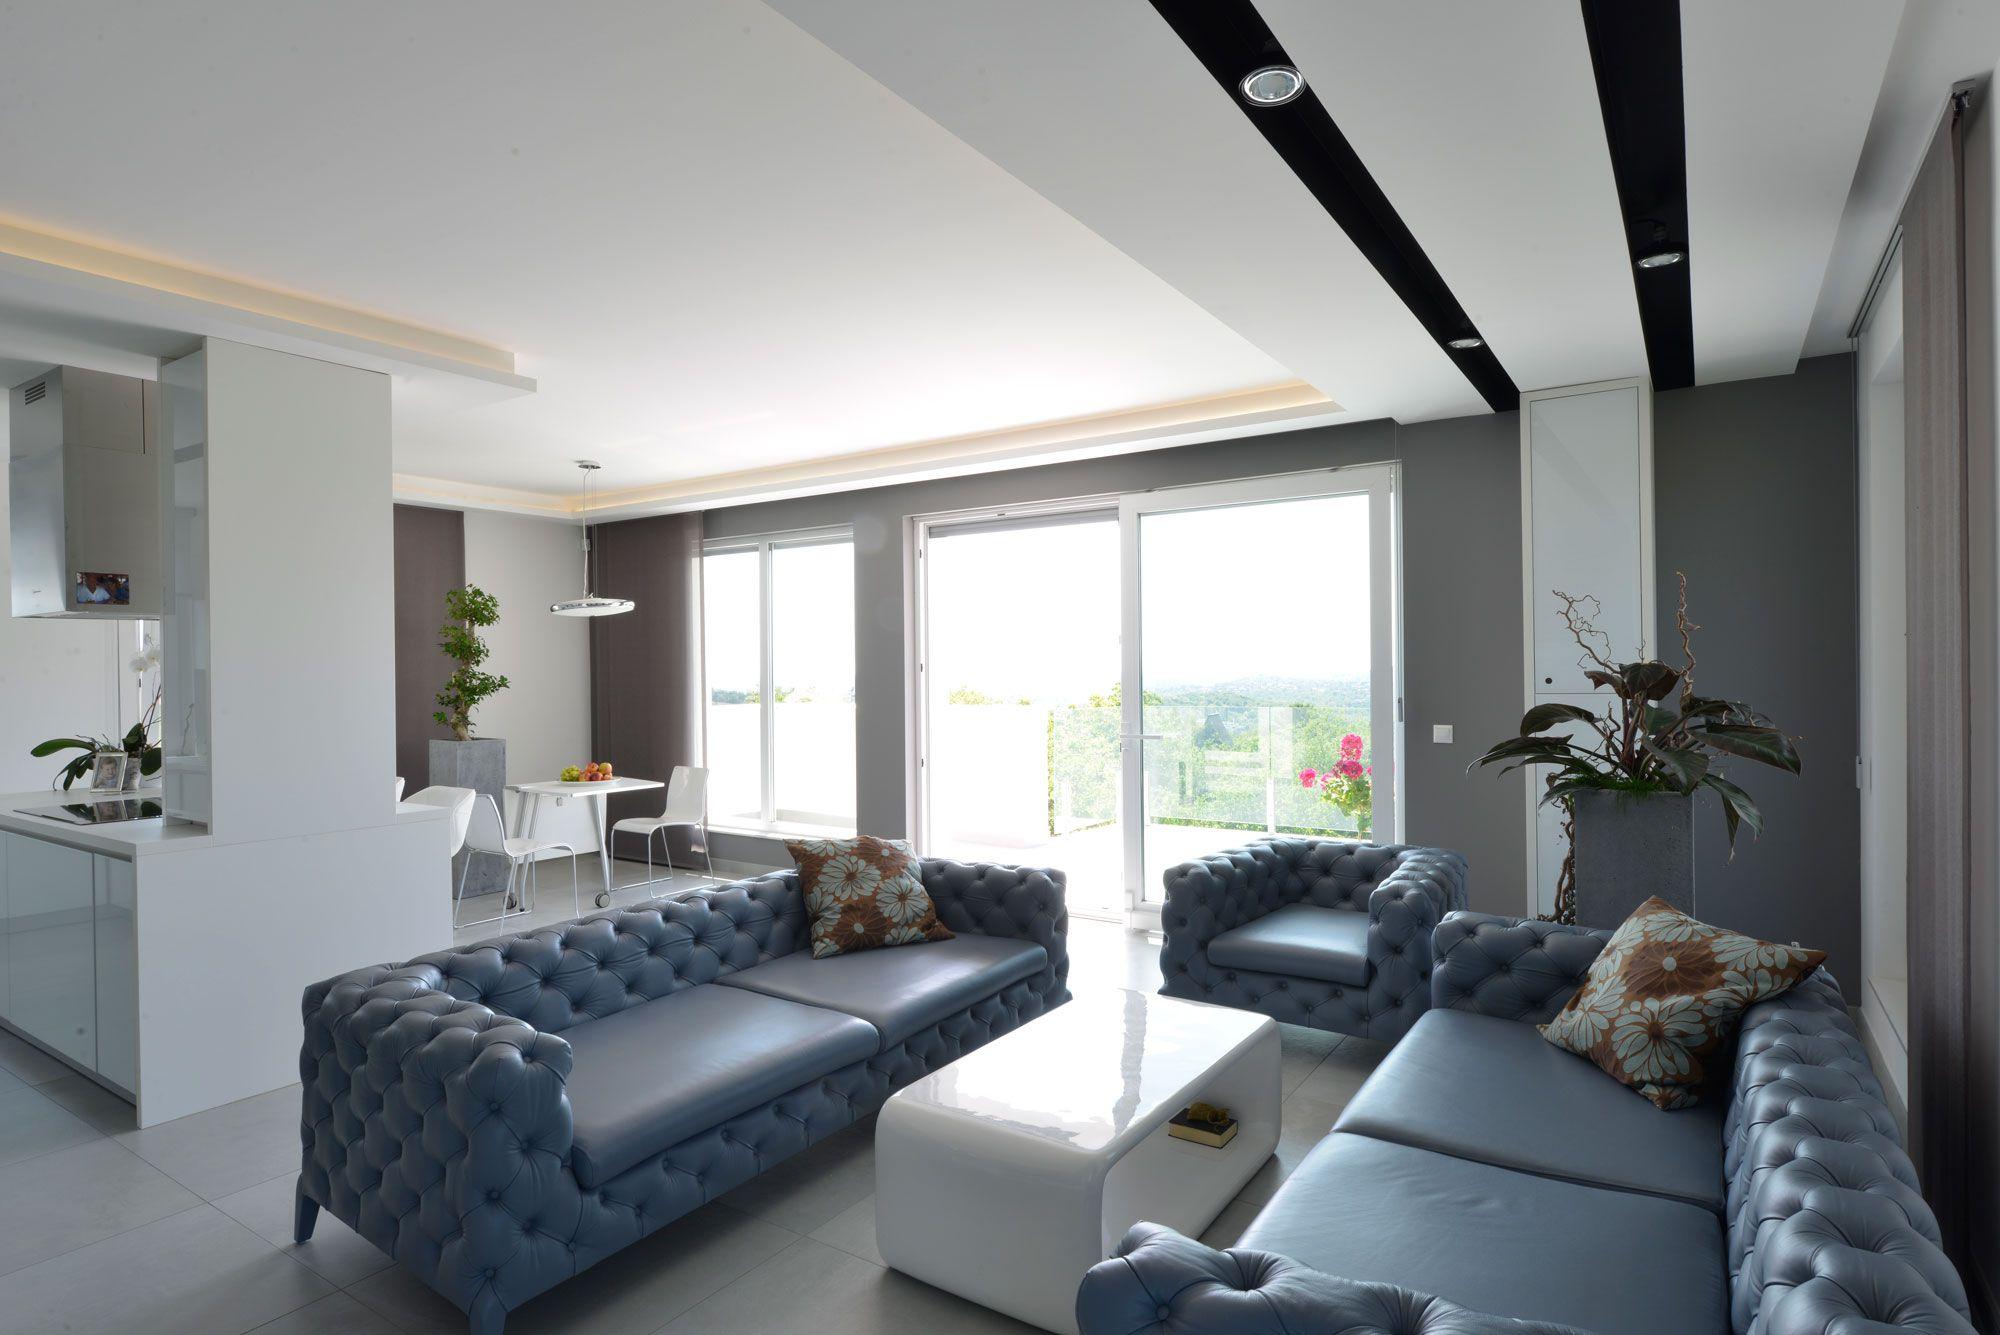 Minimalist Studio minimalist penthouseadamdesign belsőépítész studio